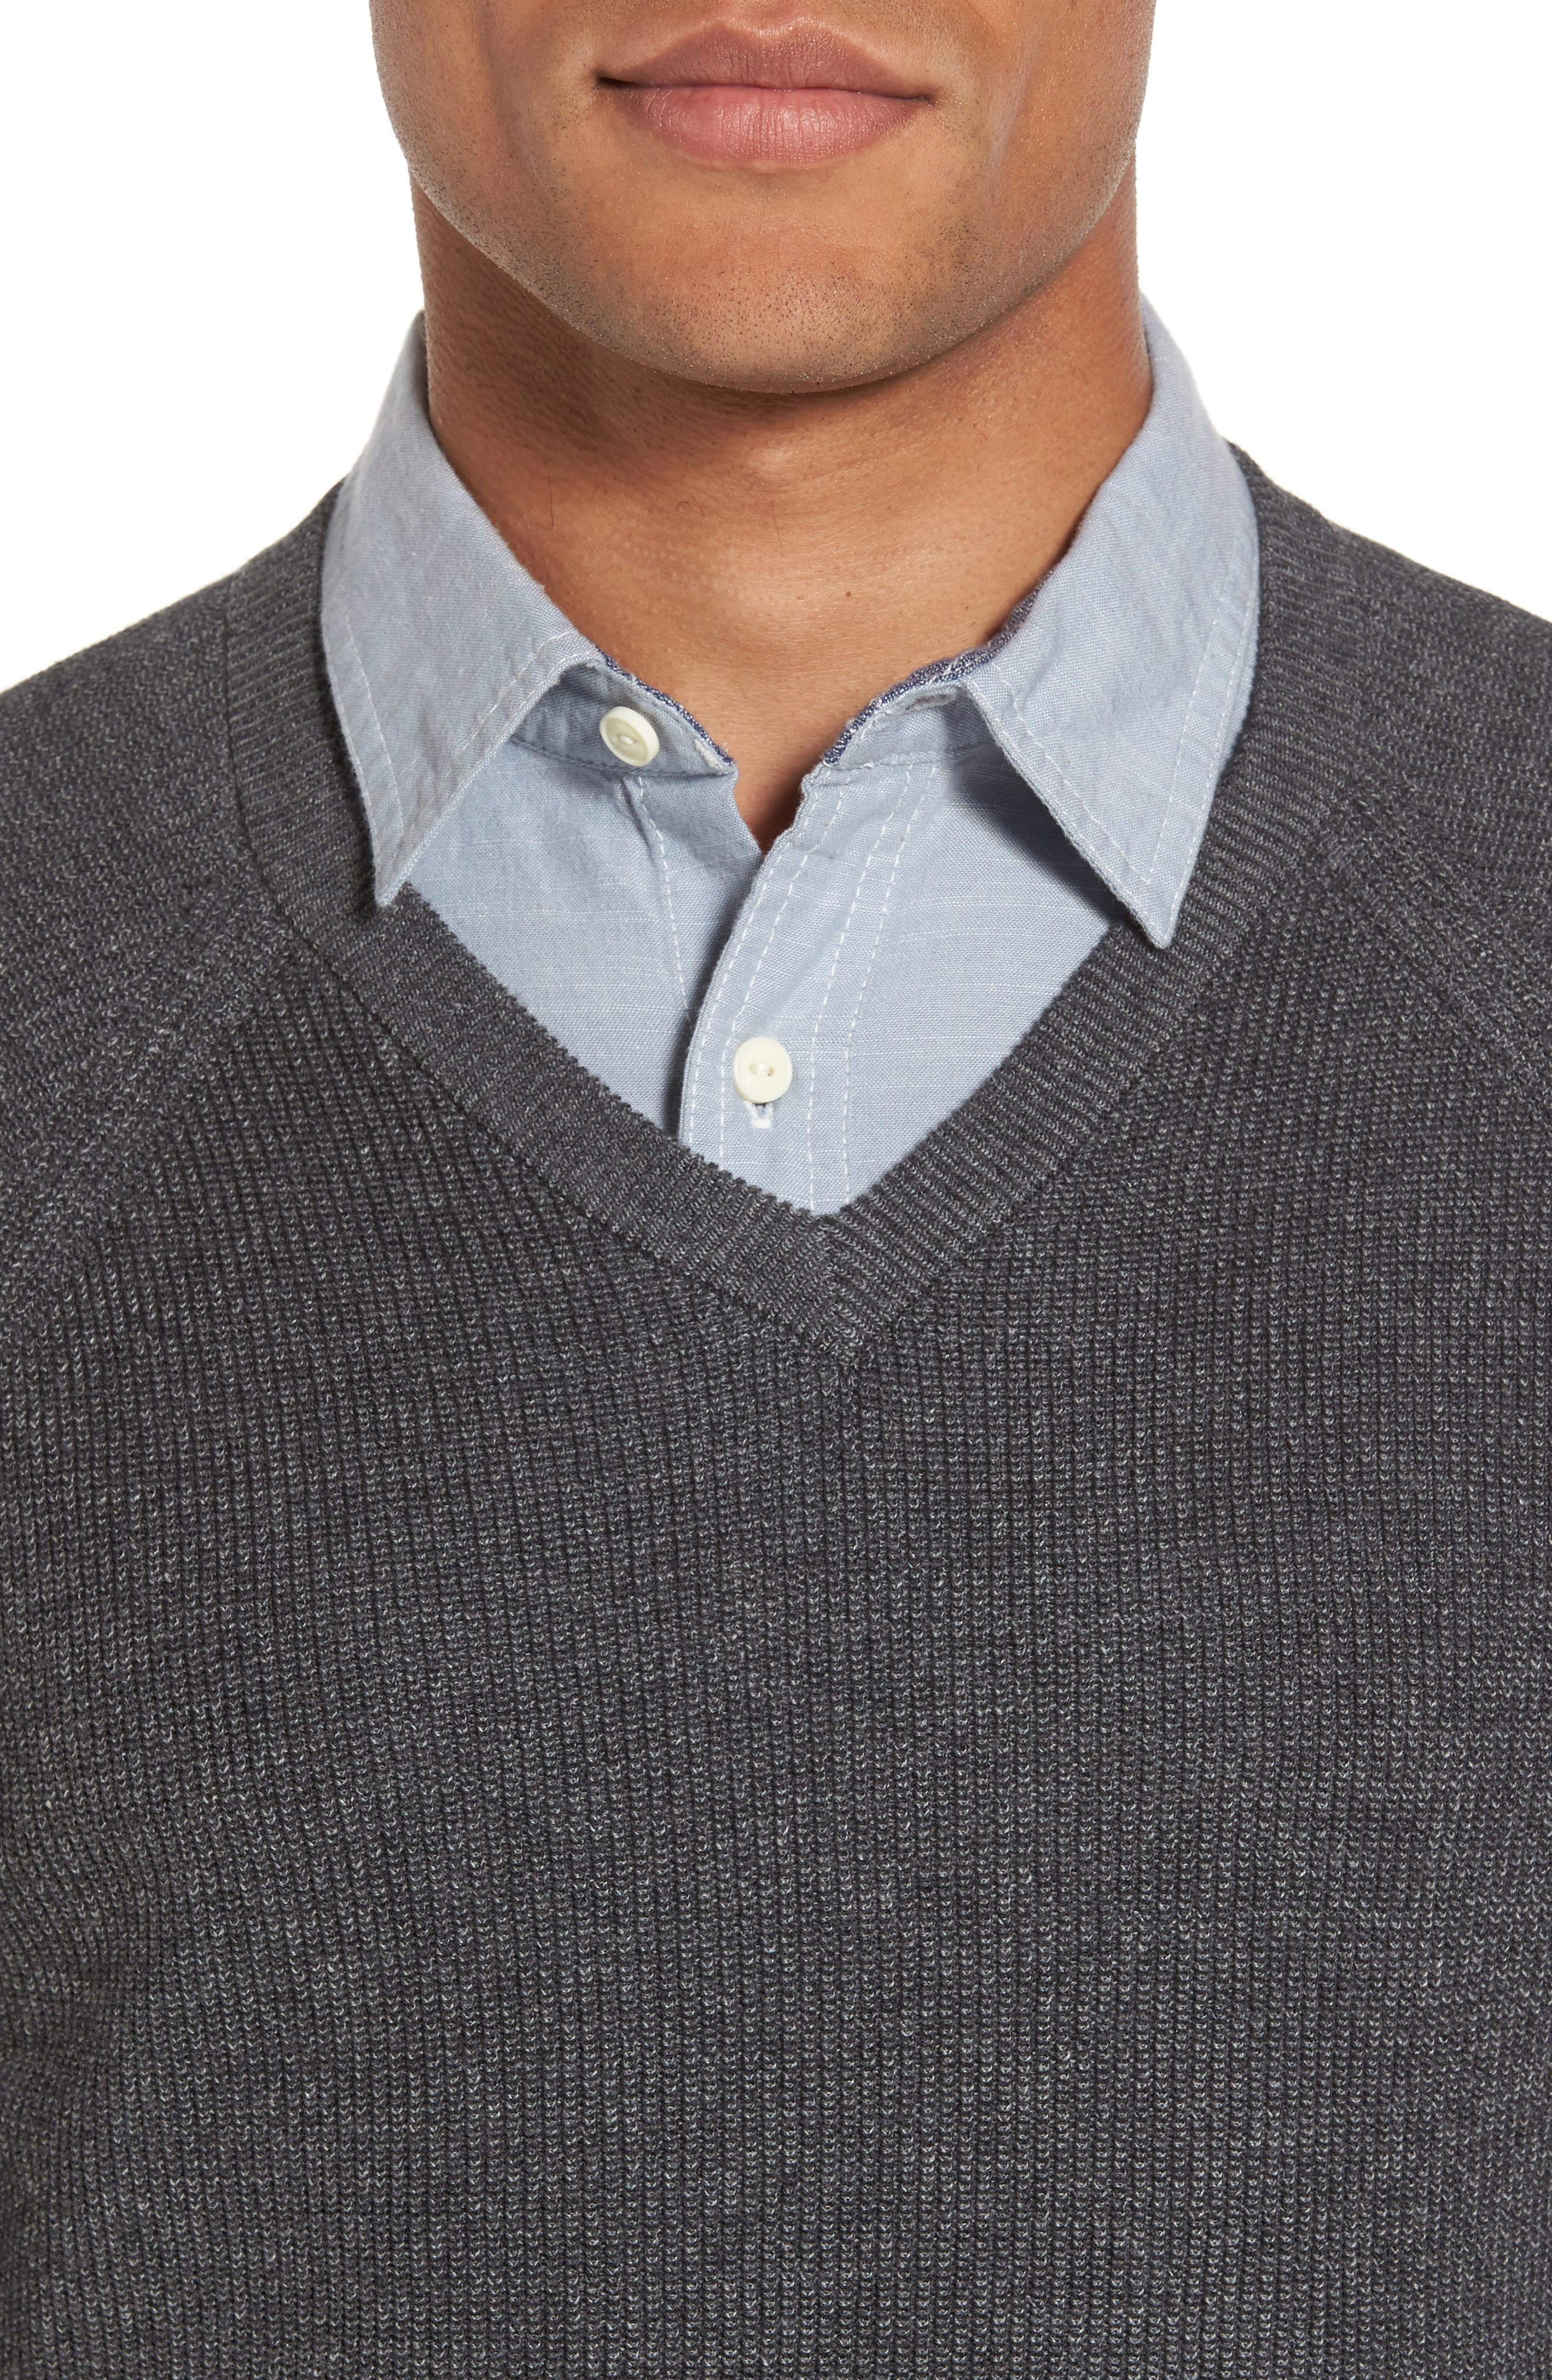 Supima<sup>®</sup> Cotton V-Neck Sweater,                             Alternate thumbnail 4, color,                             021